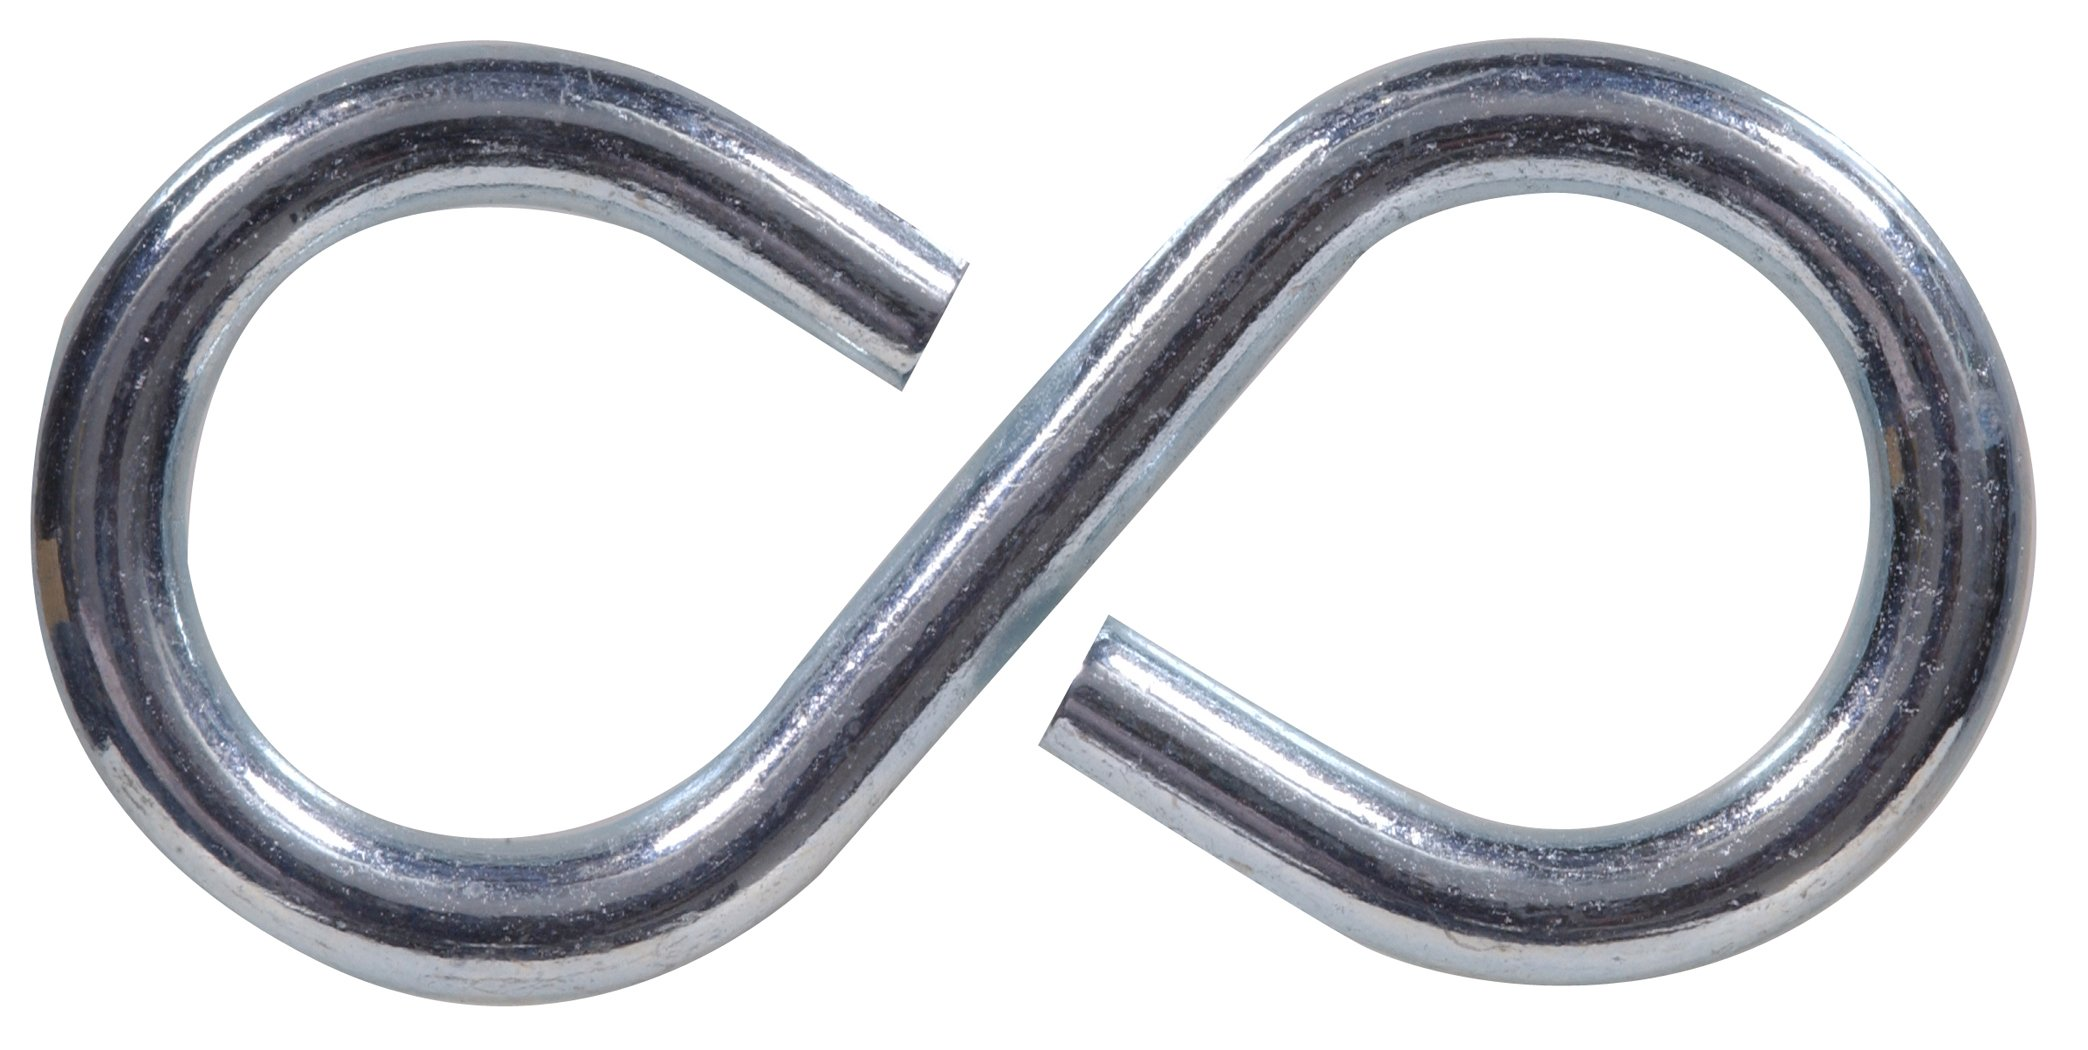 Hillman Hardware Essentials S Hook 1-5/8'', Zinc Finish, 100-Pack